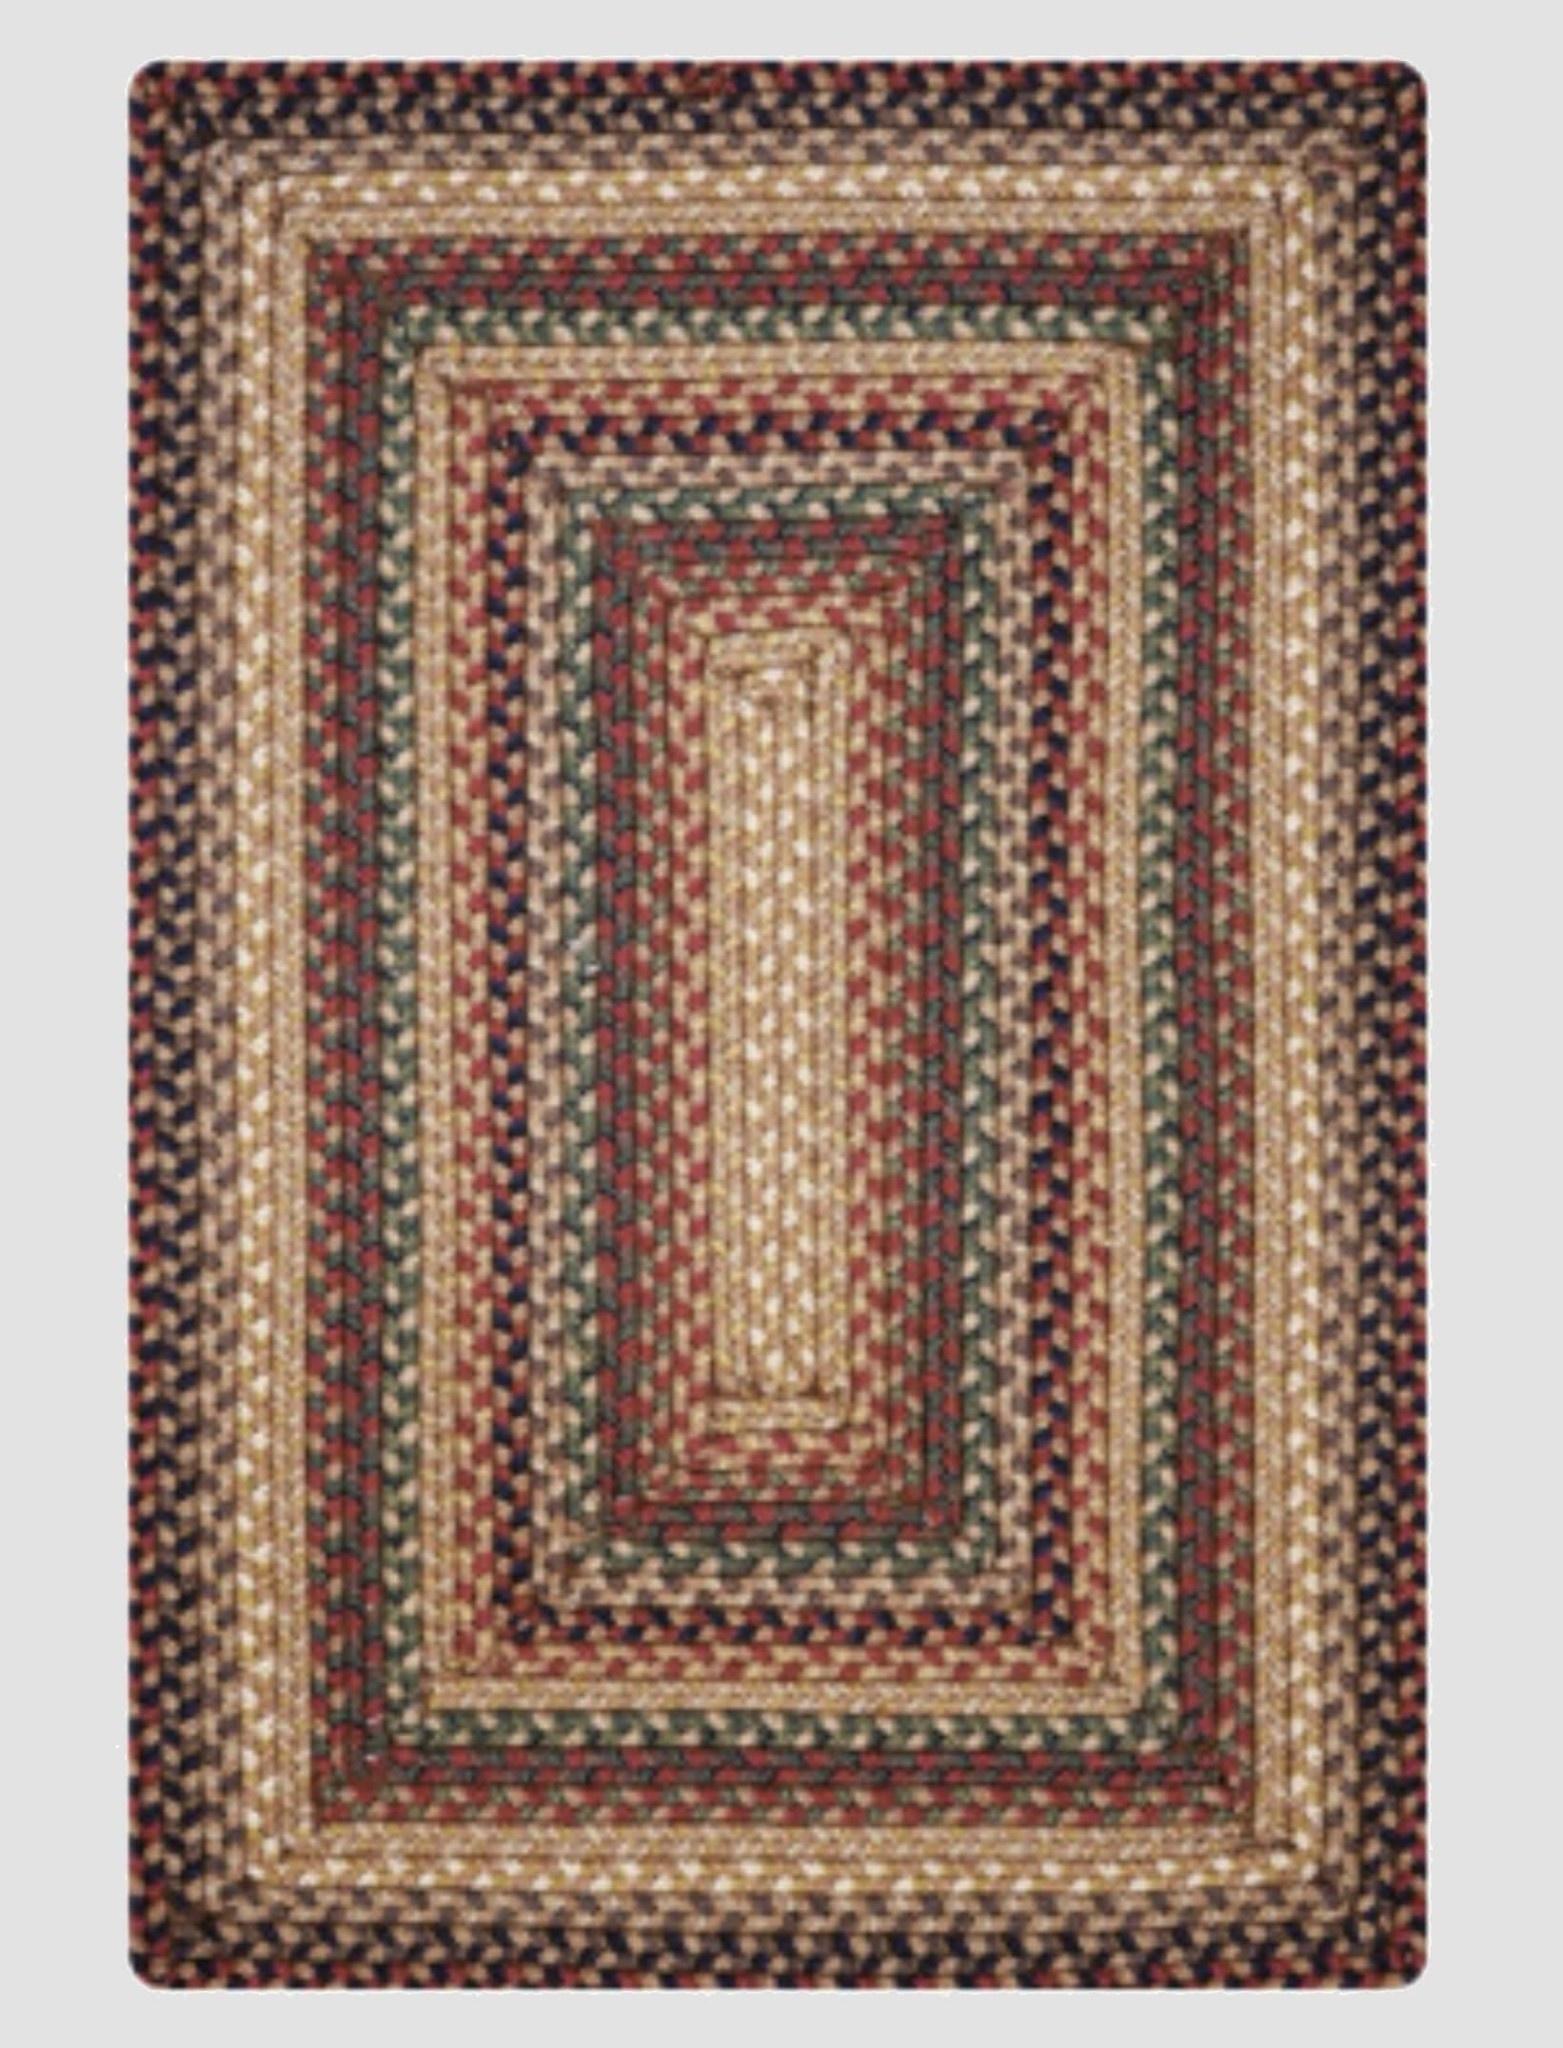 Homespice Decor Canterbury Ultra Wool Braided Rug - Rectangle